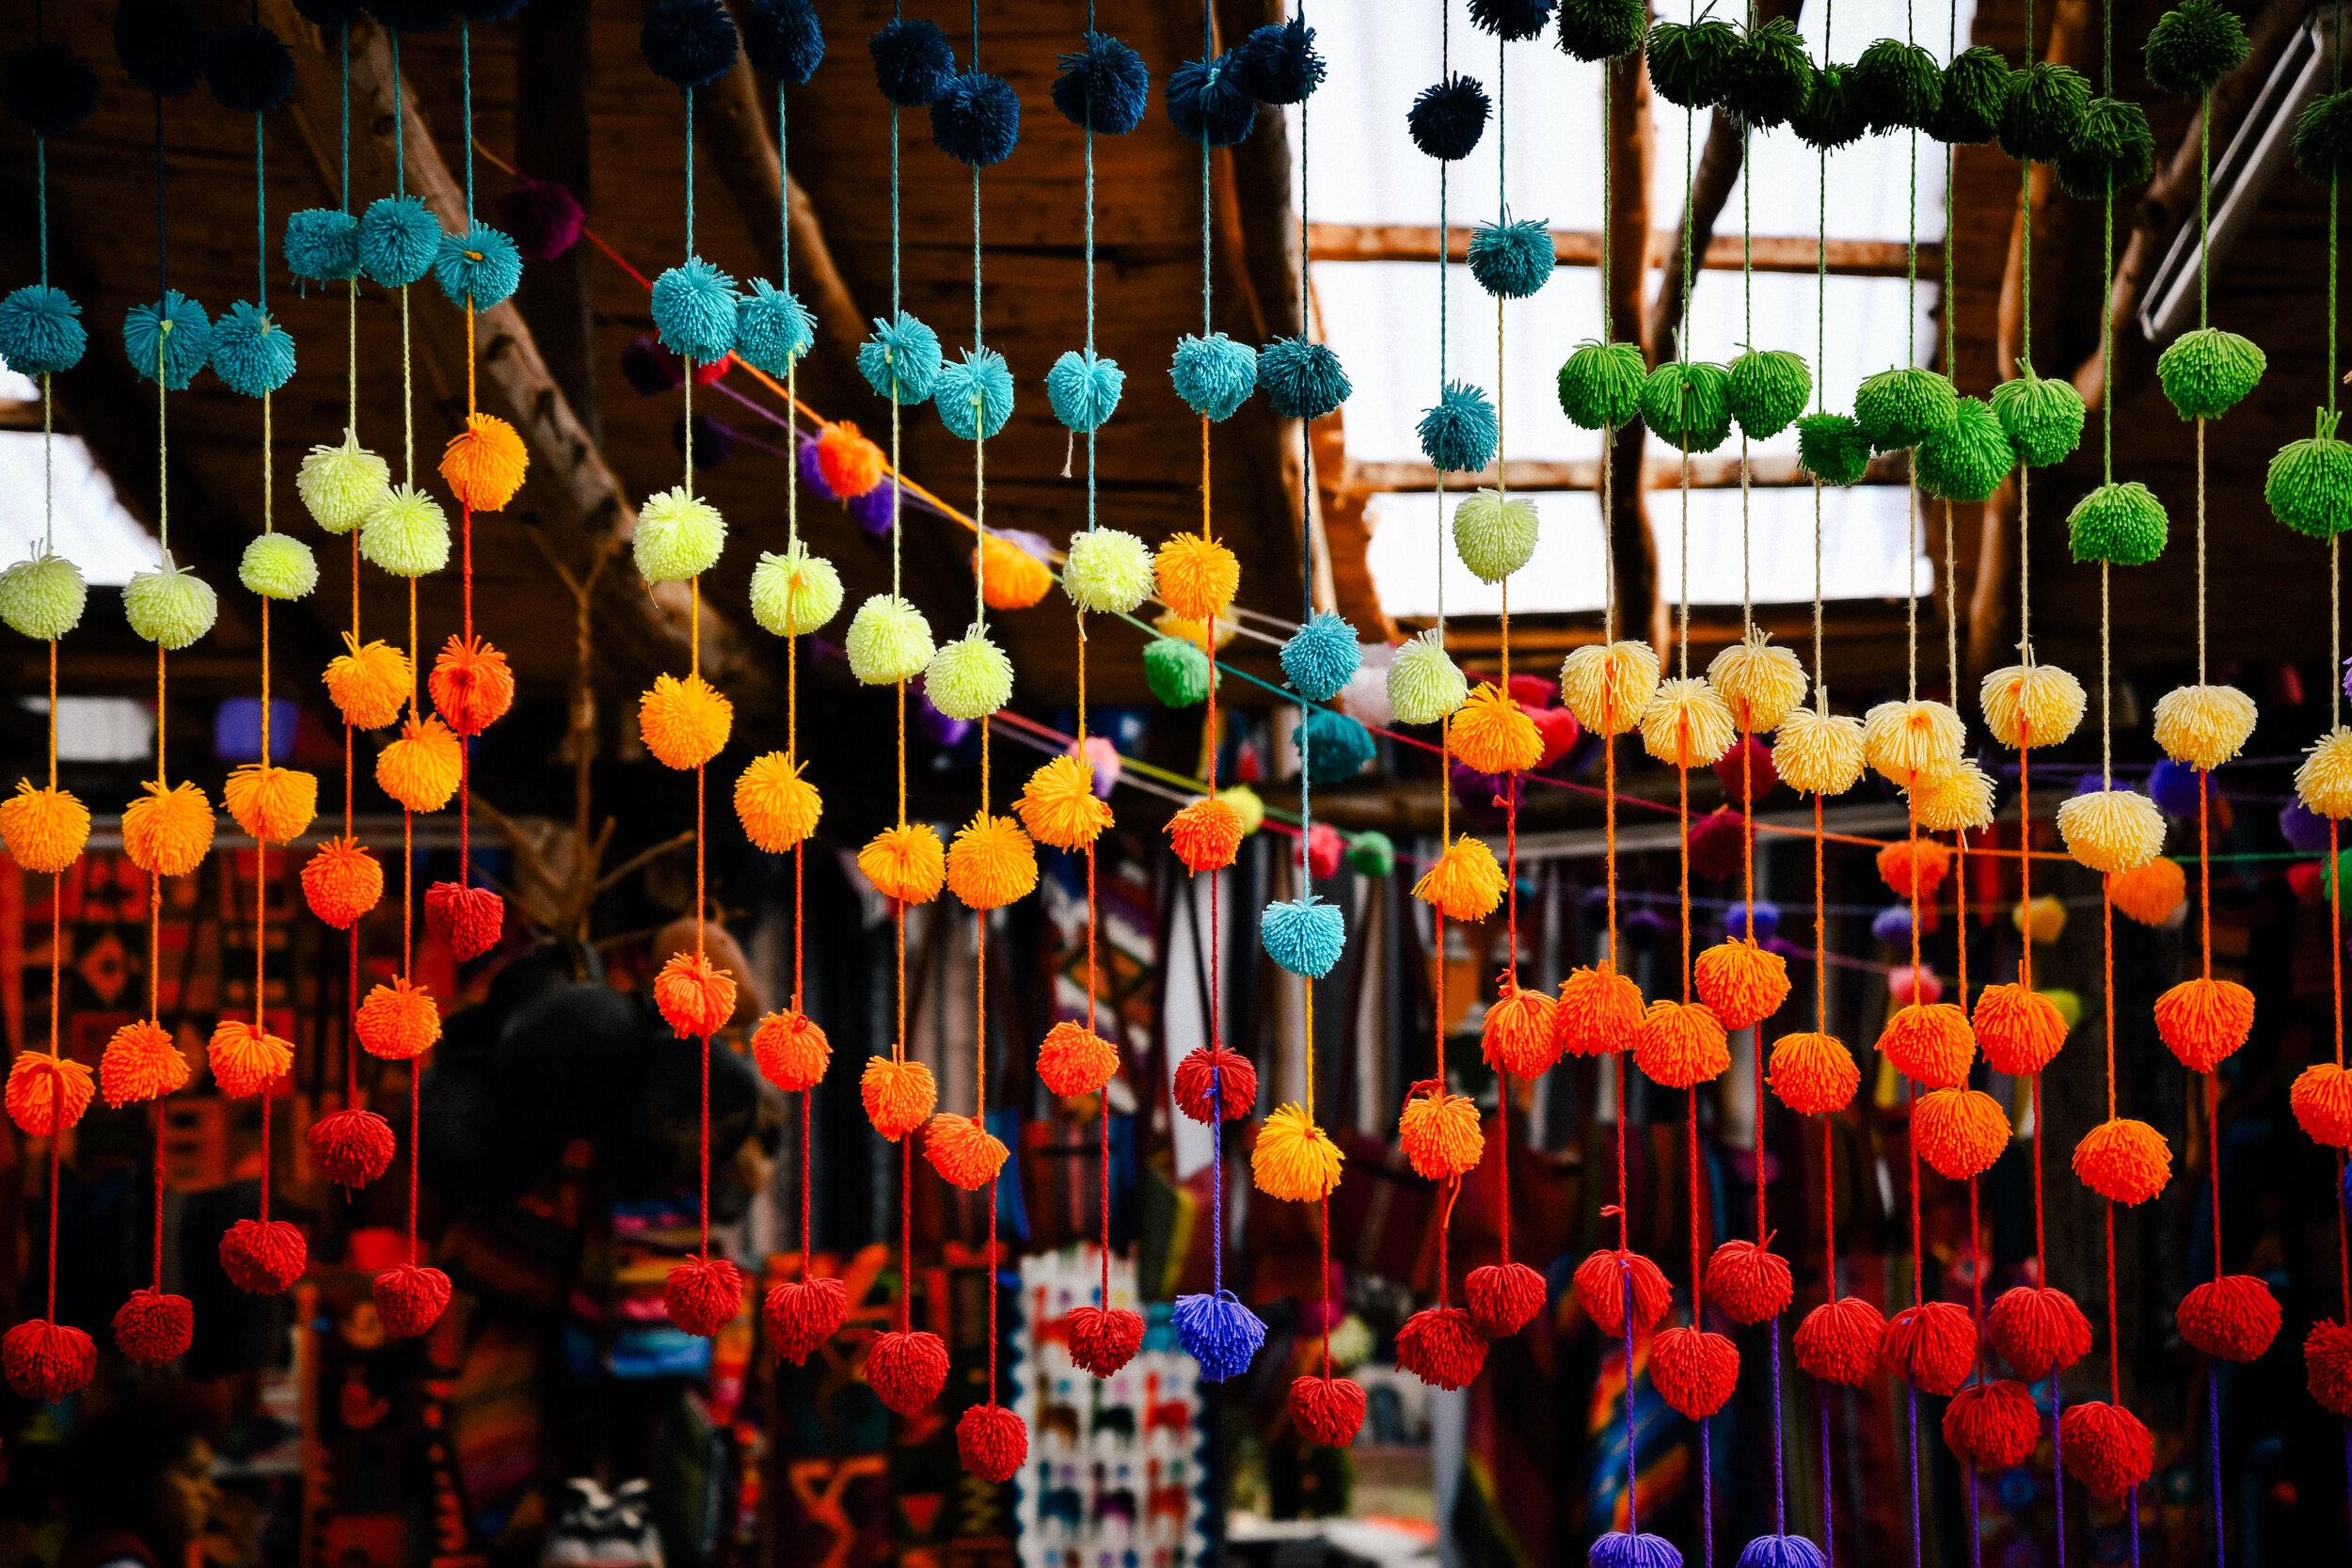 dyed puff balls in Chinchero